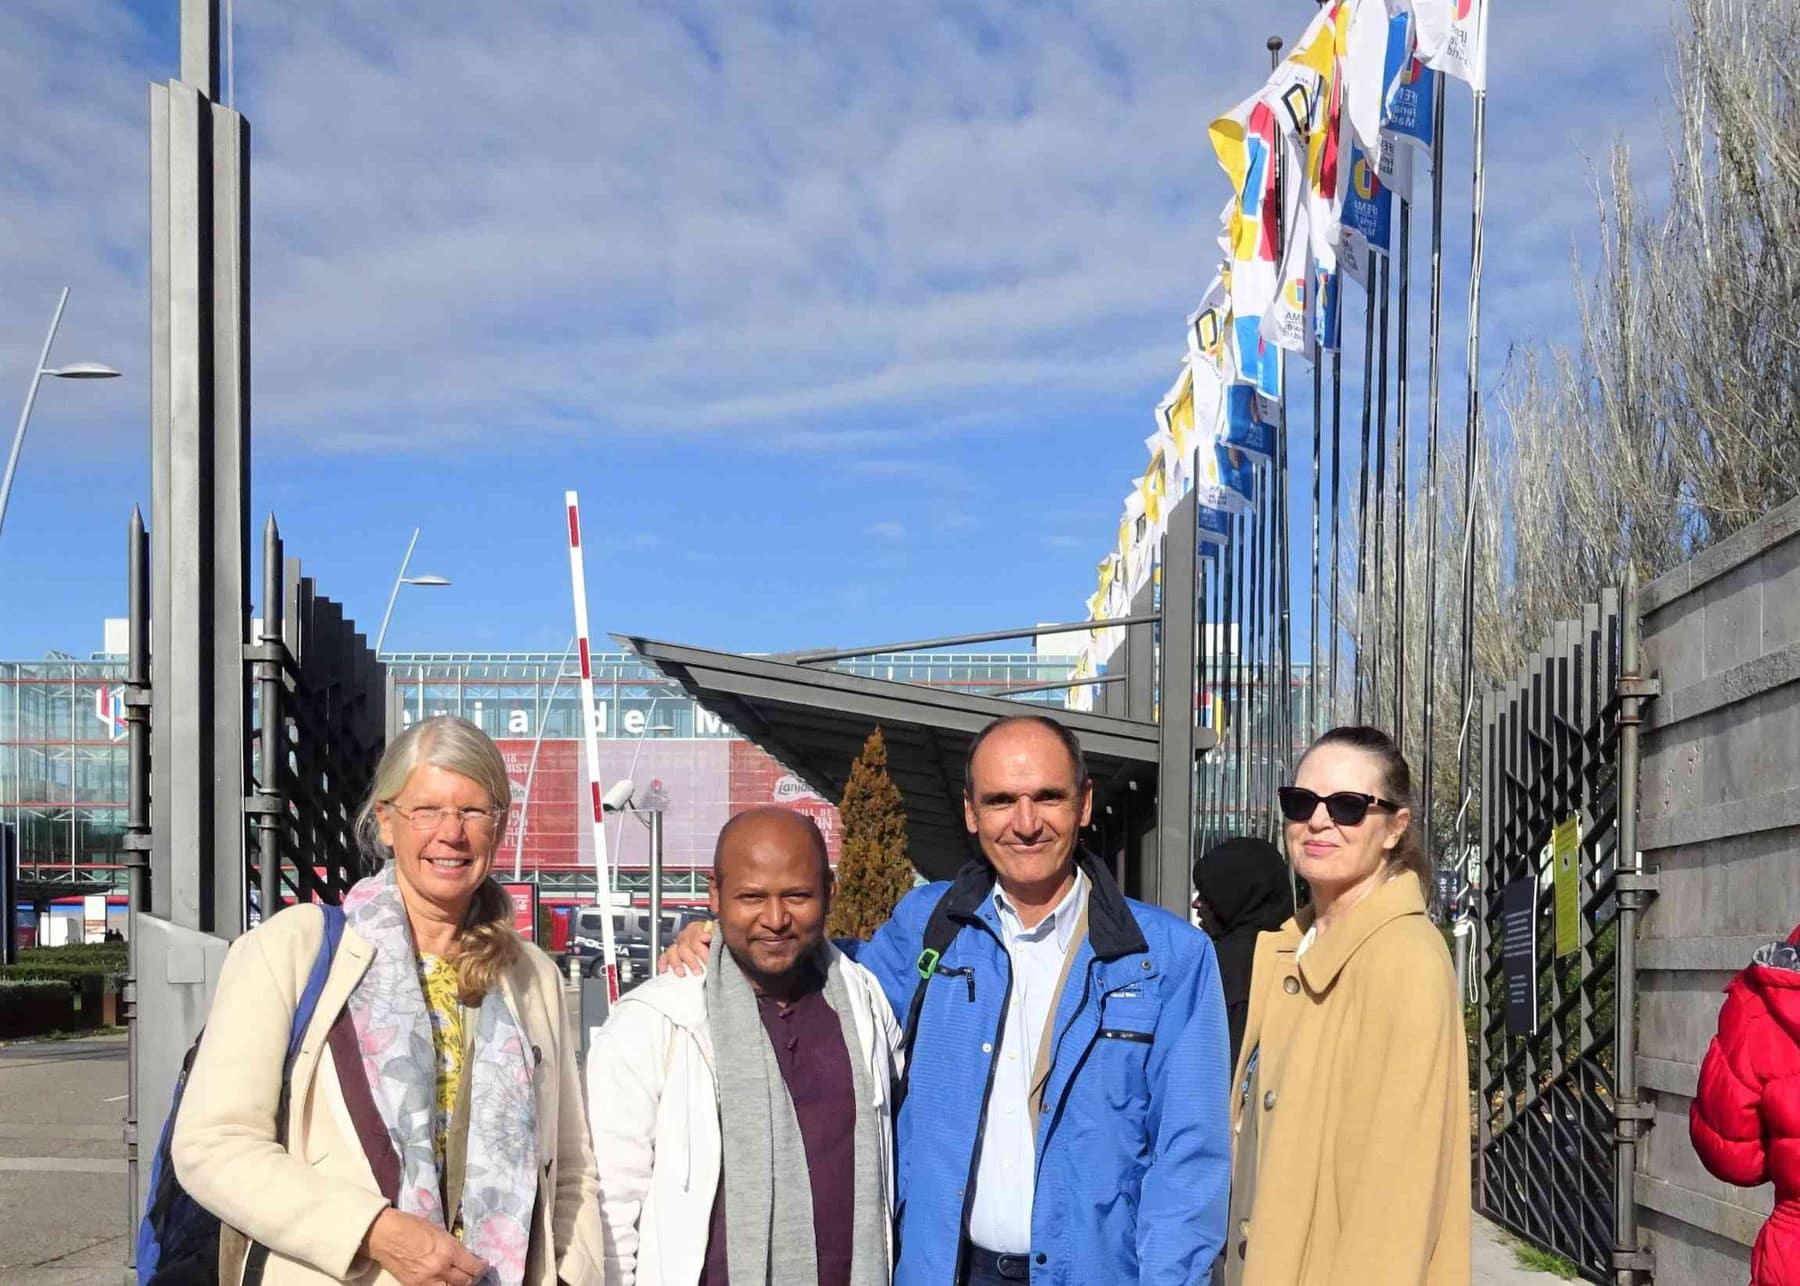 Sonja, Shantanau, Golo and Julia at the COP25 entrance